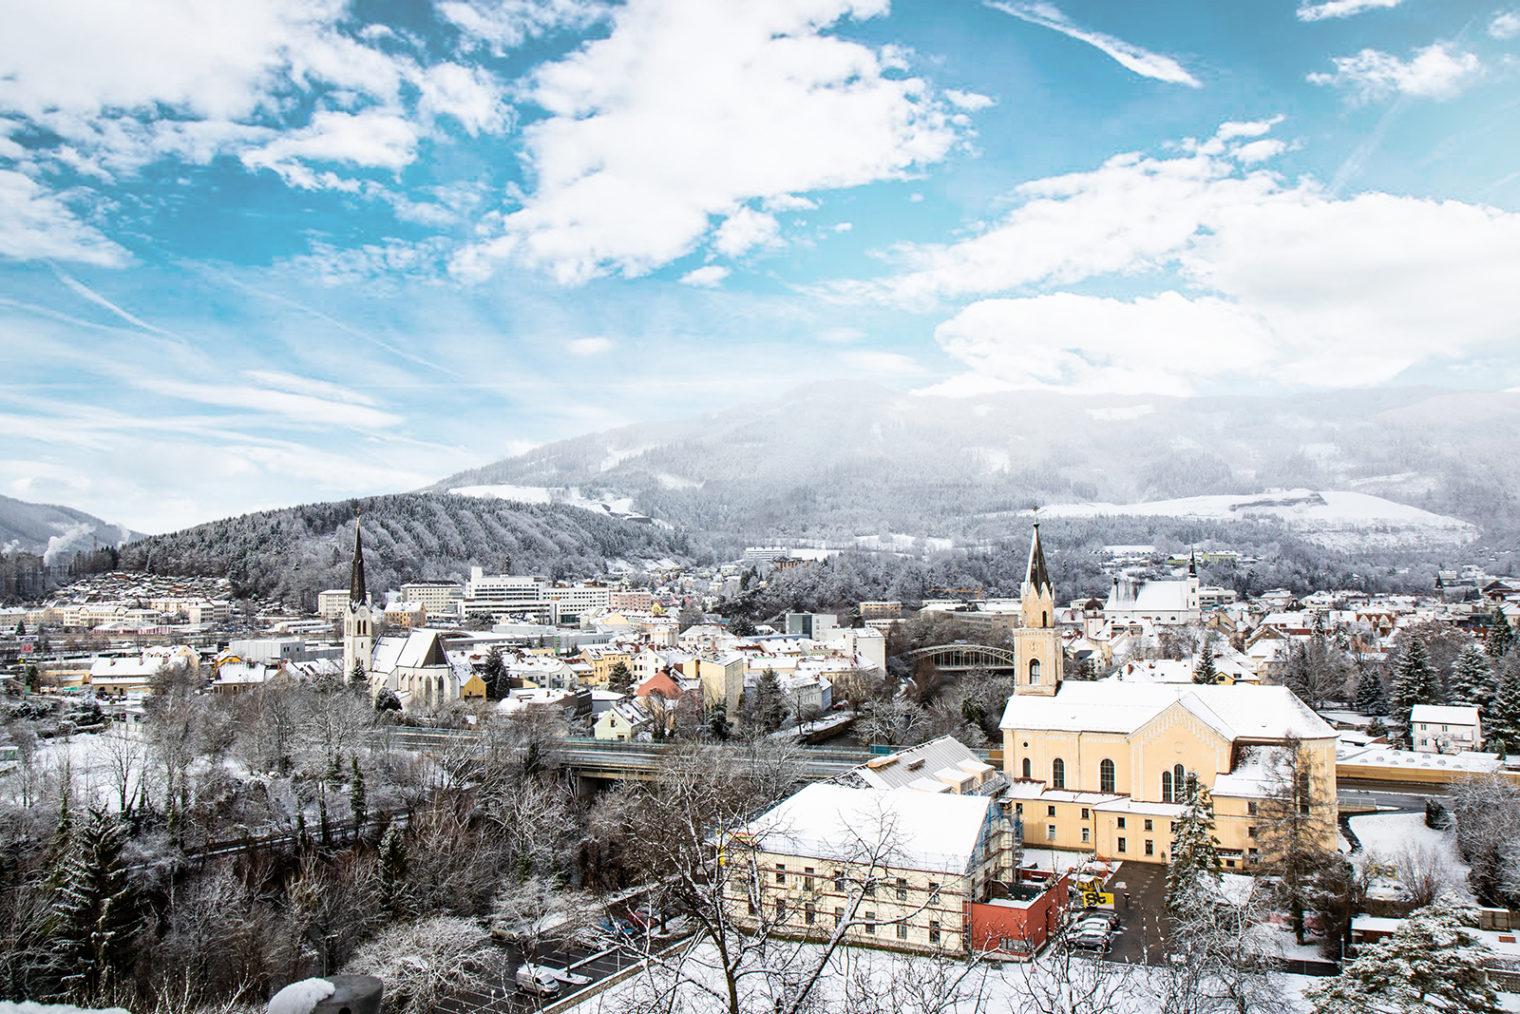 View of the City of Leoben in winter